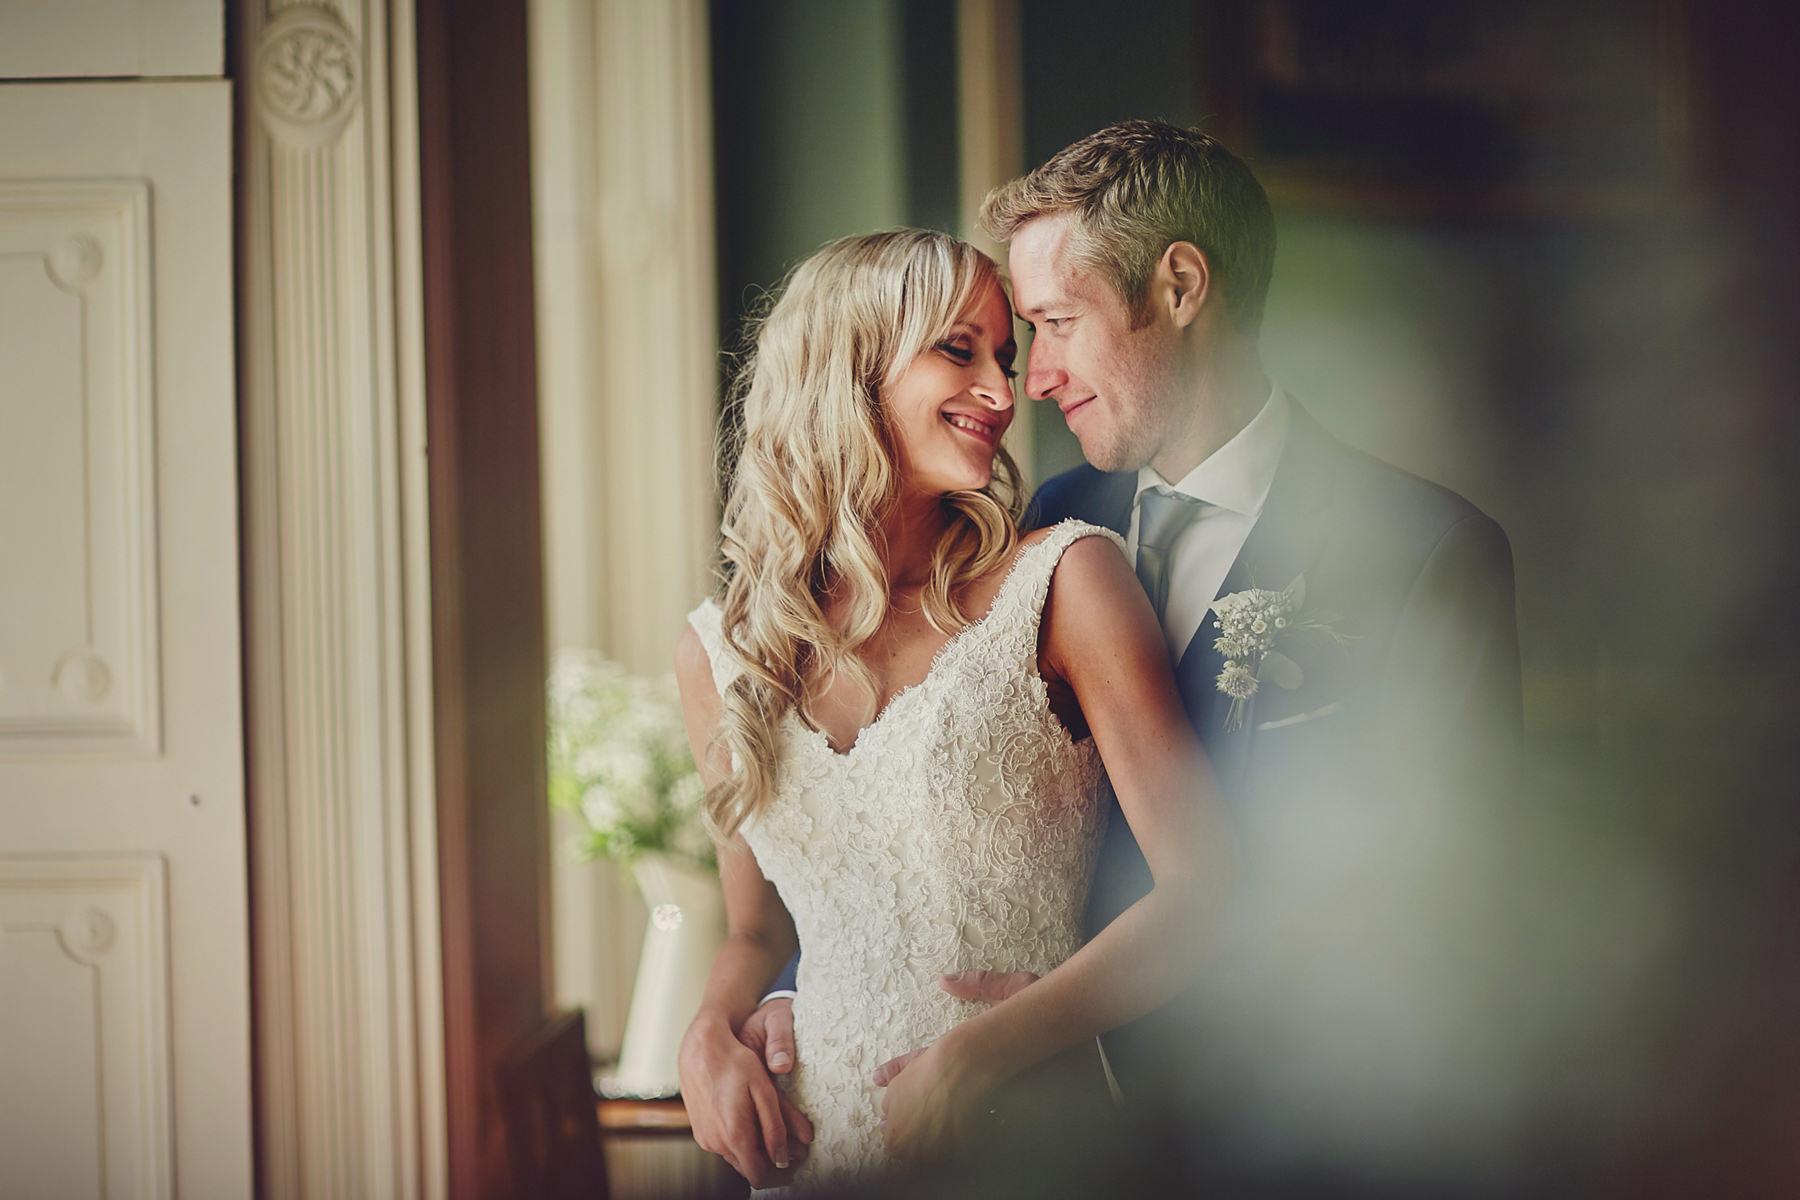 Wedding at Borris House co.Carlow 051 - Borris House wedding | Cara & David